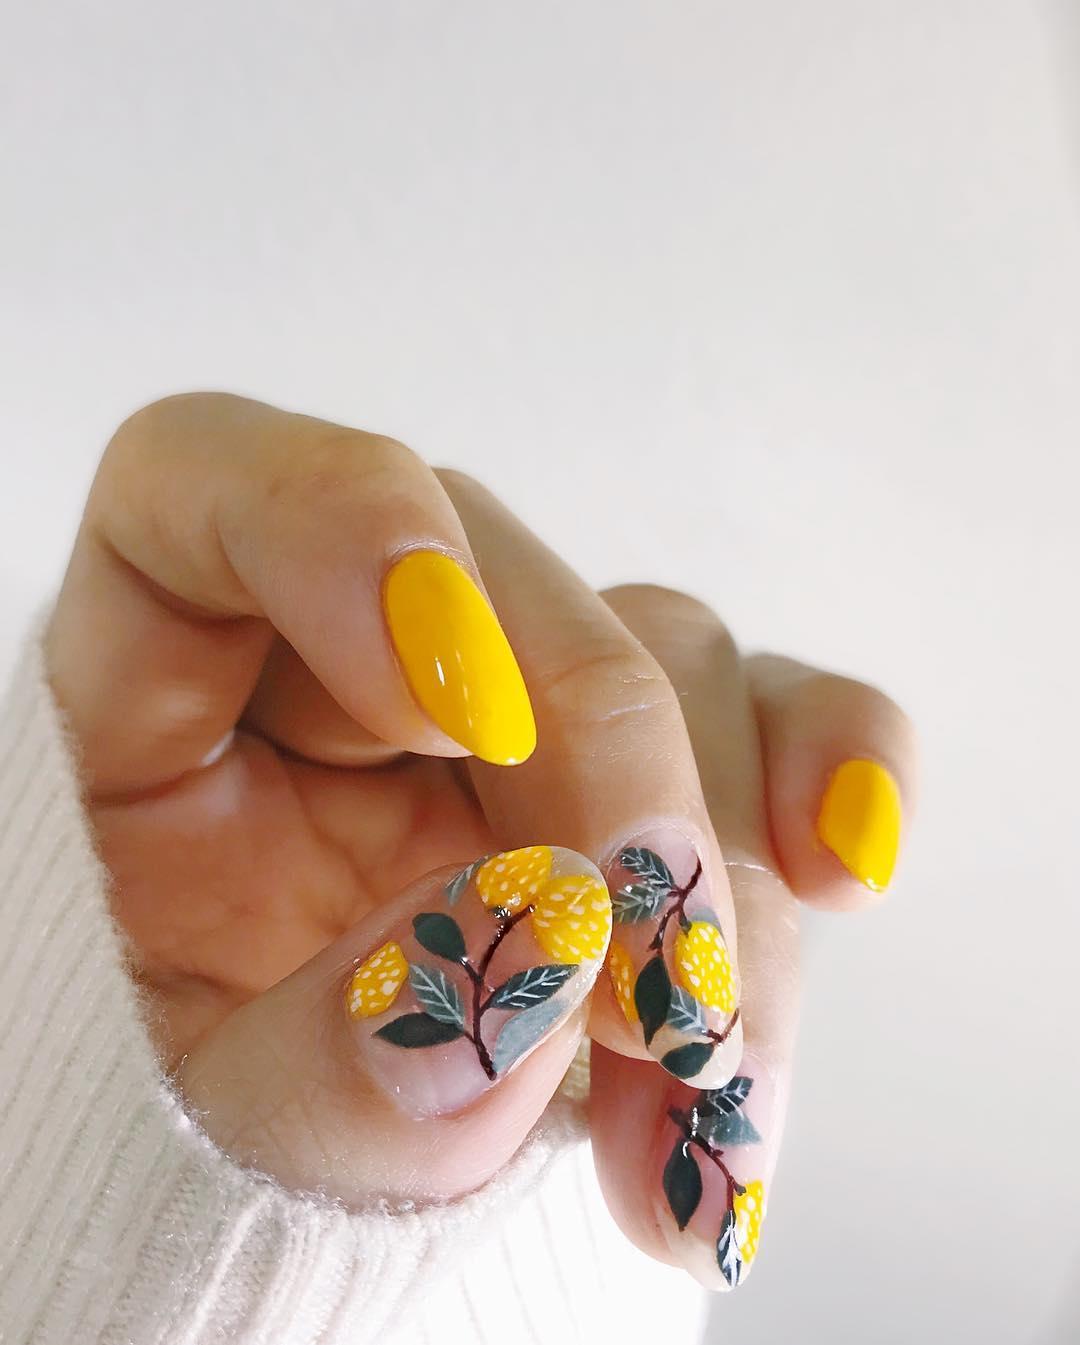 Cute yellow lemon and fruit nails